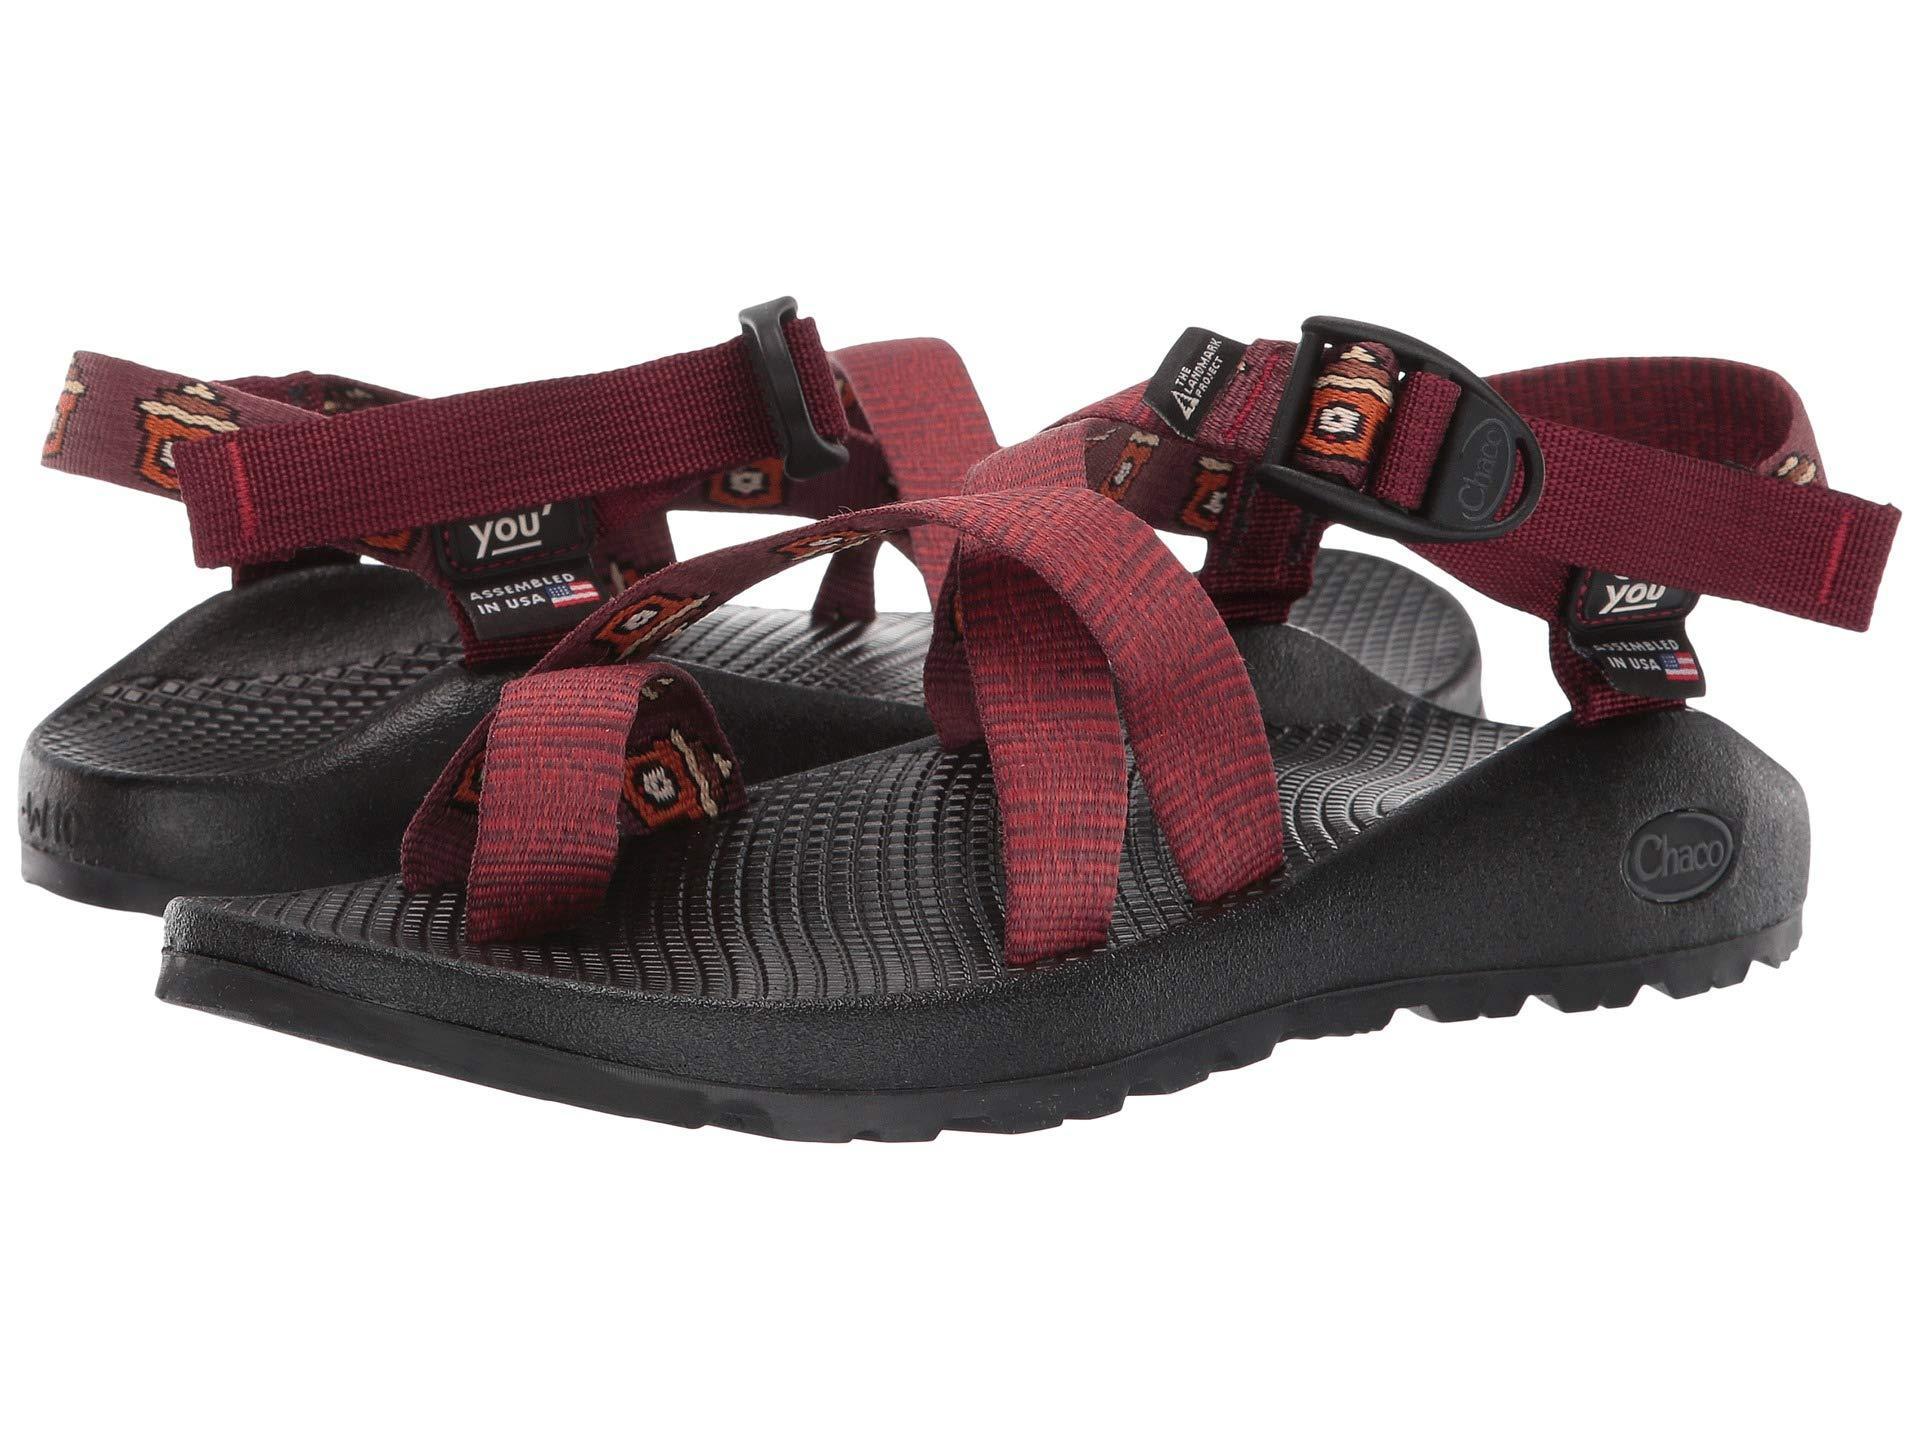 9656380c6110 Chaco - Multicolor Smokey Bear Z 2 Classic (smokey Face Port) Women s  Sandals. View fullscreen